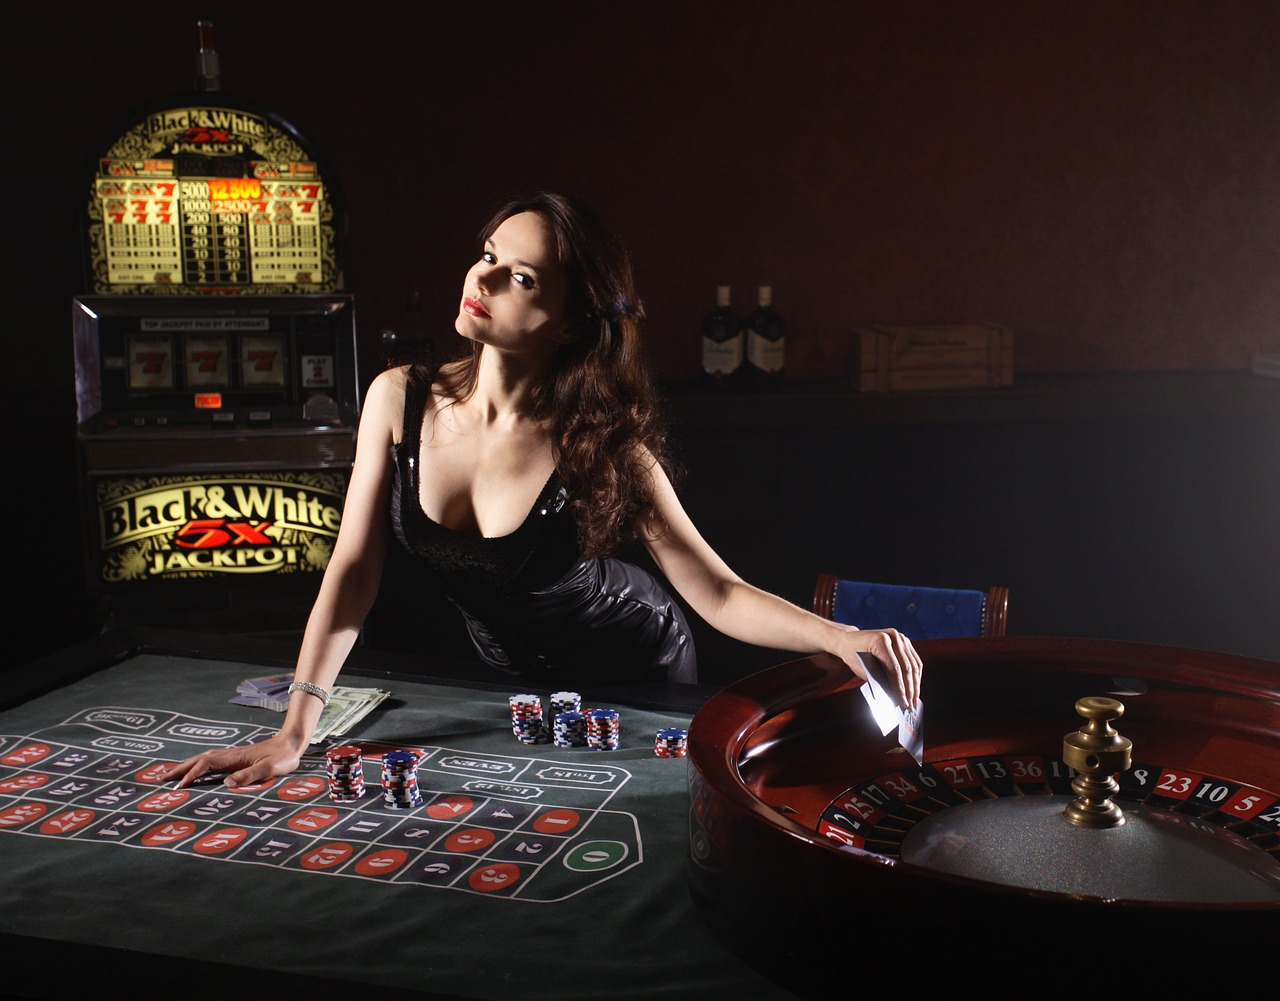 casinodealer_1